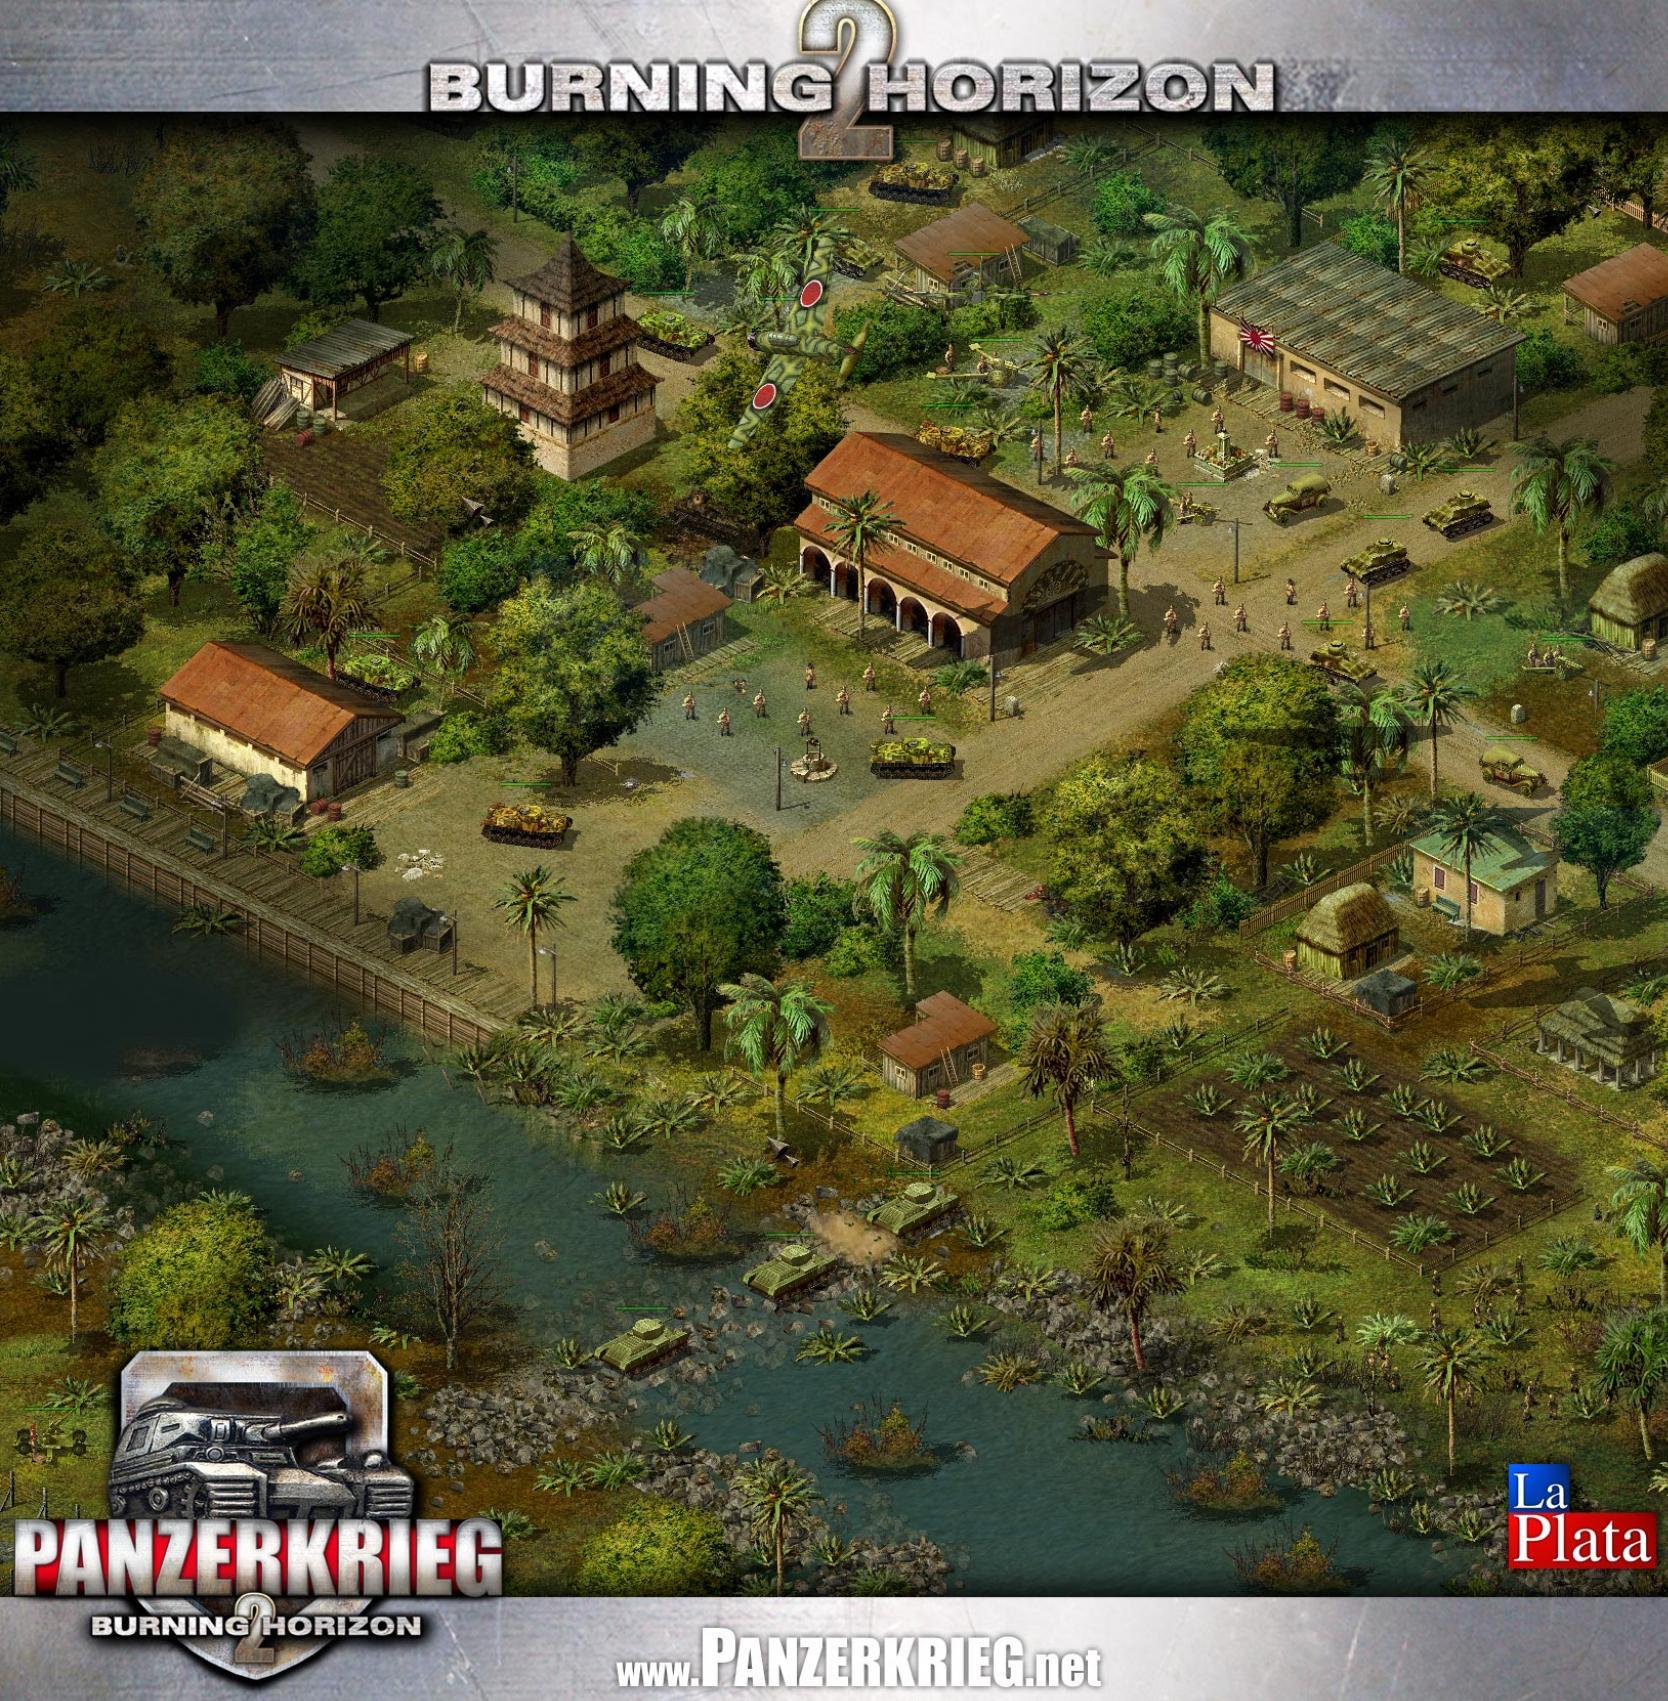 http://www.igroport.ru/games_img/67998_panzerkrieg_burning_horizon_2-12.jpg